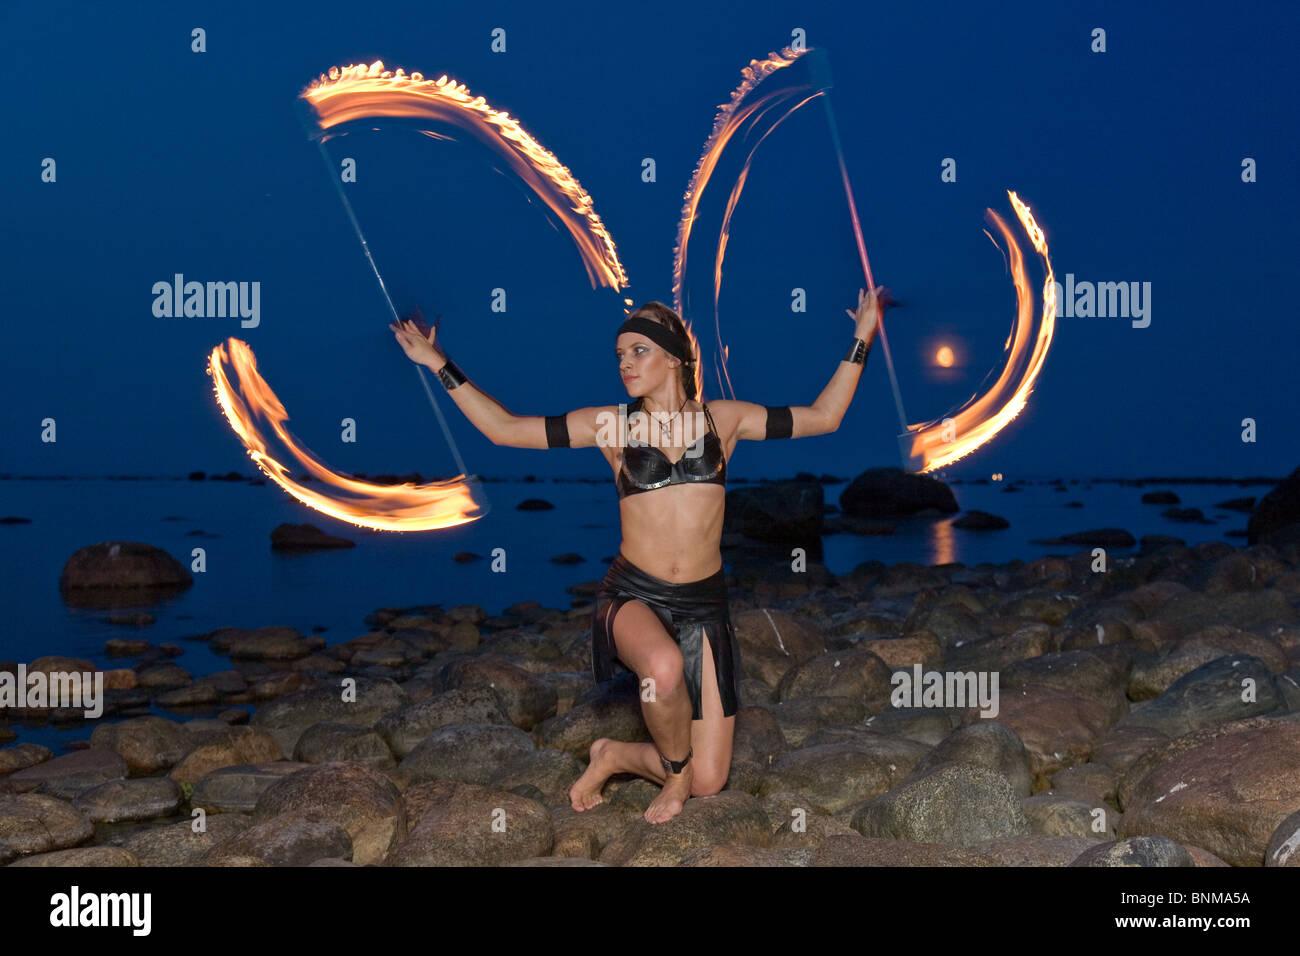 Fire Dancer - Stock Image